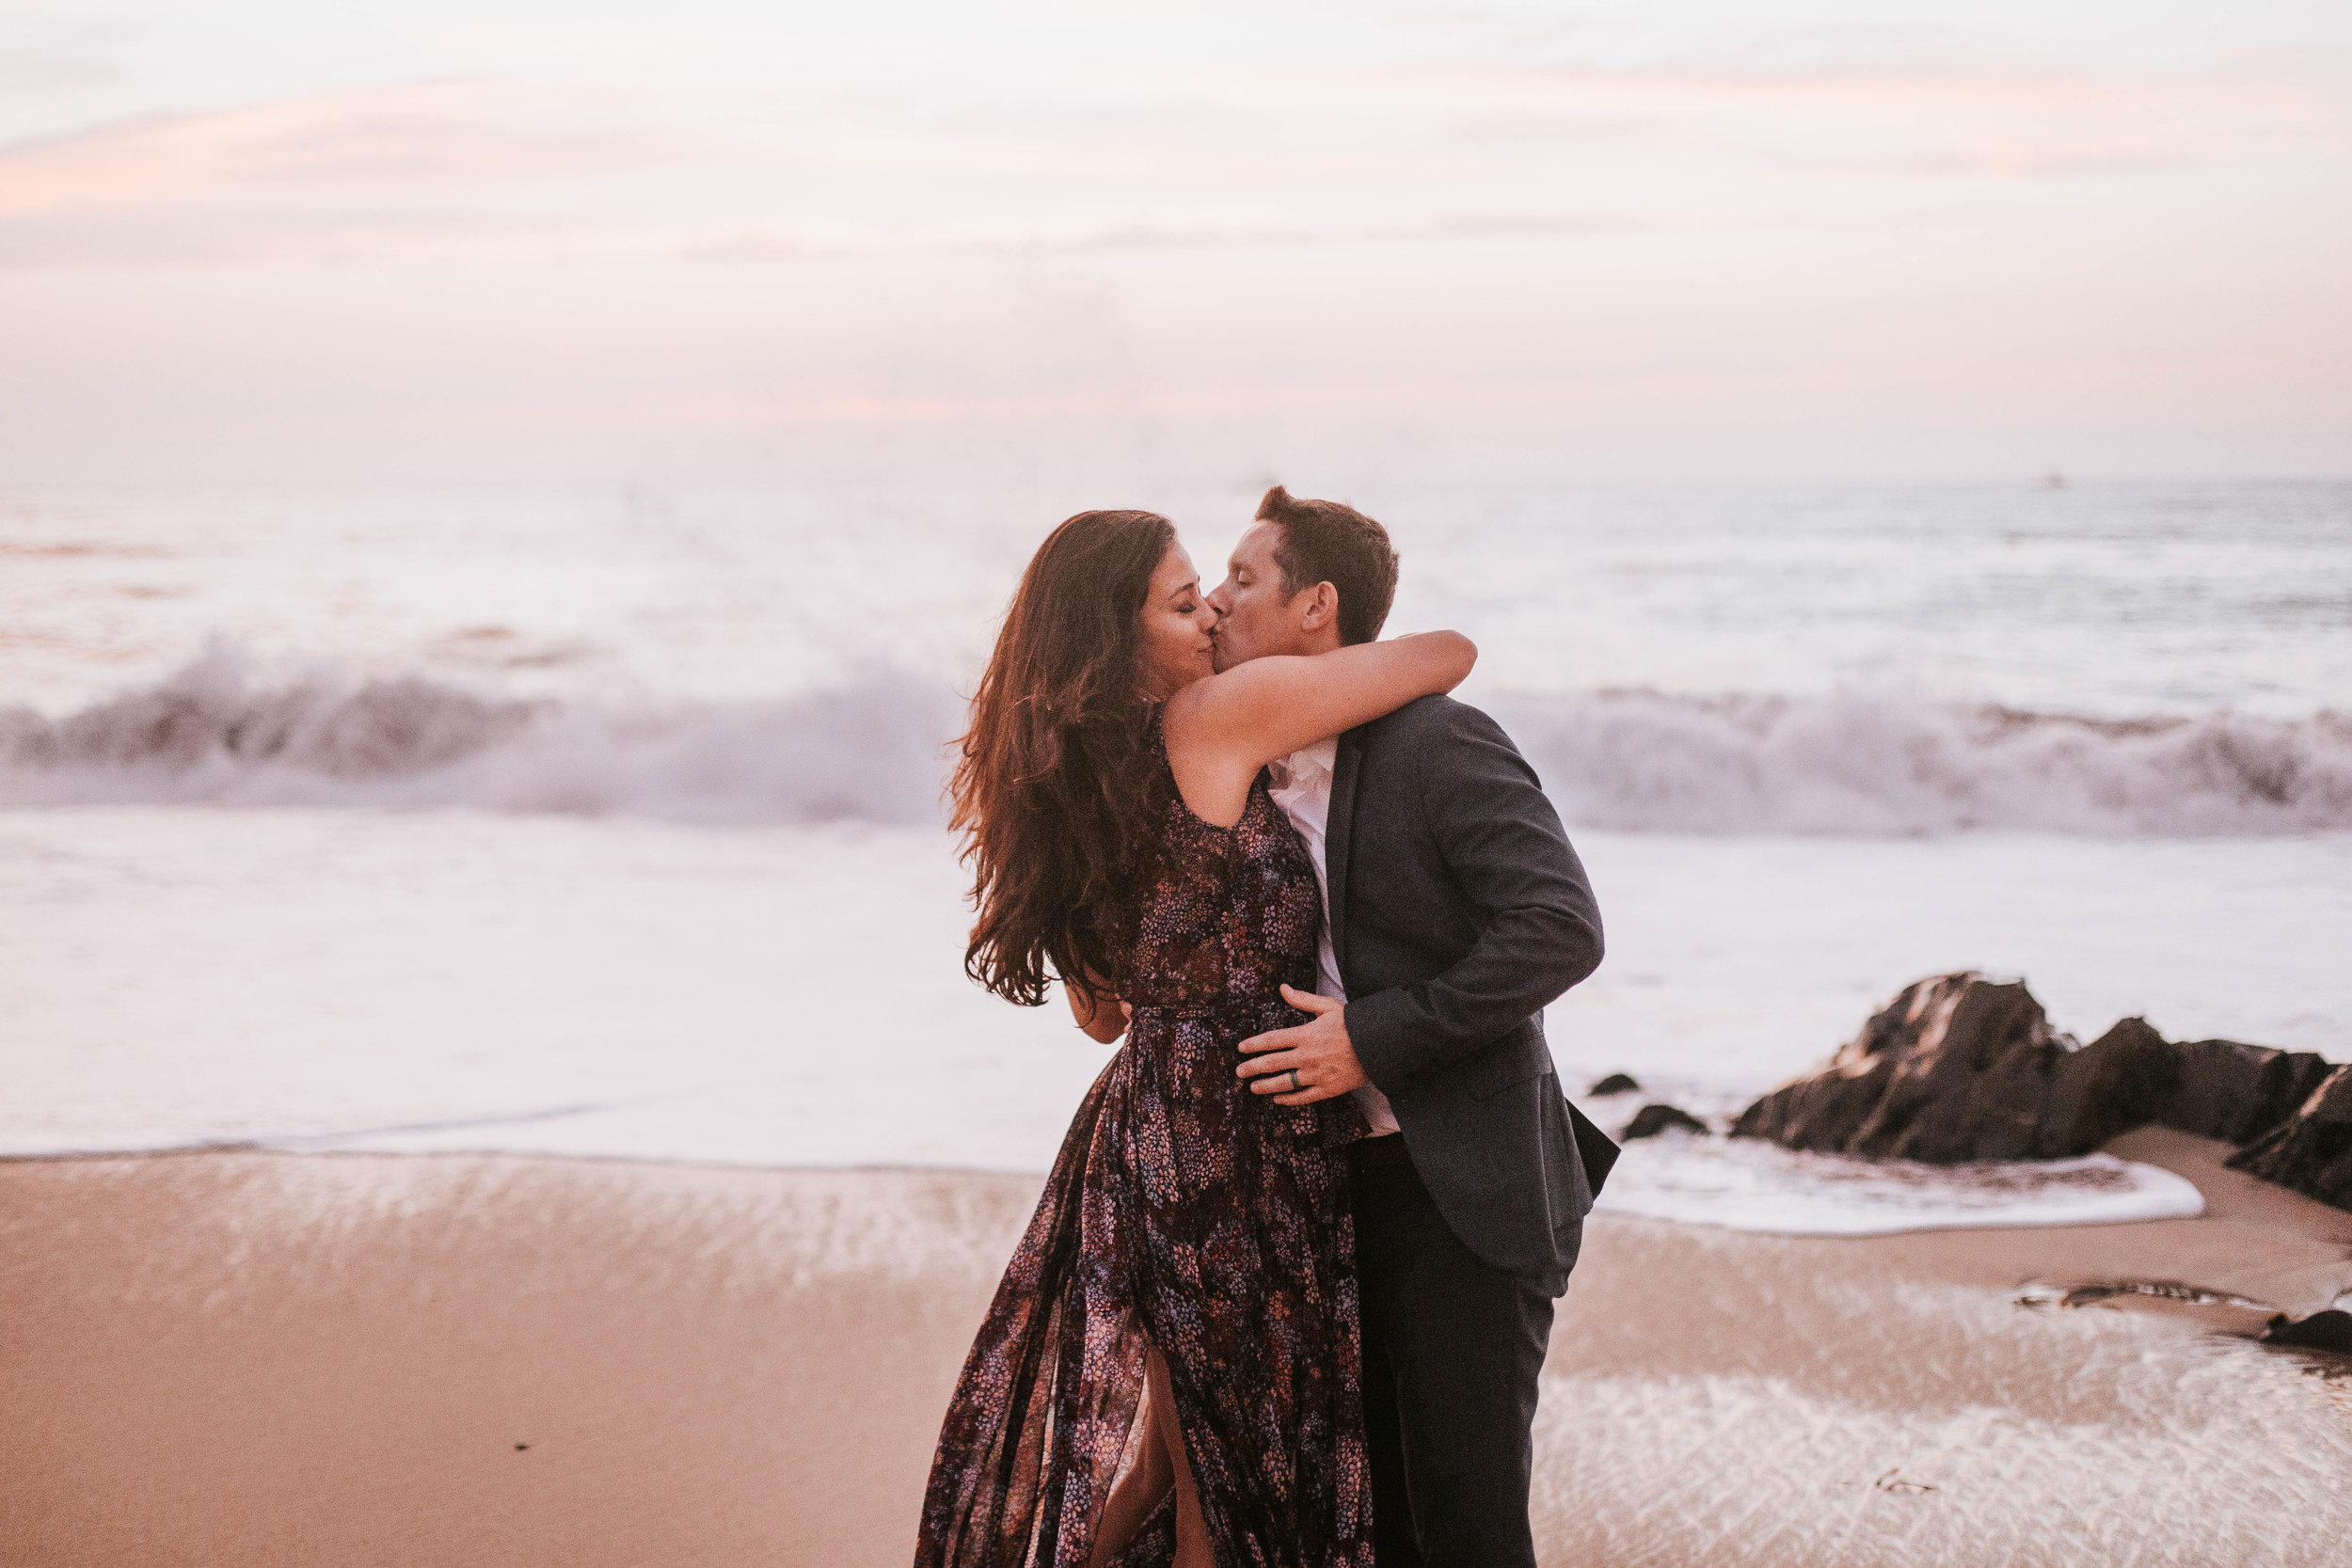 nicole-daacke-photography-big-sur-california-coast-adventure-engagement-photos-adventurous-elopement-intimate-wedding-photographer-golden-coastal-cali-engagement-session-32.jpg